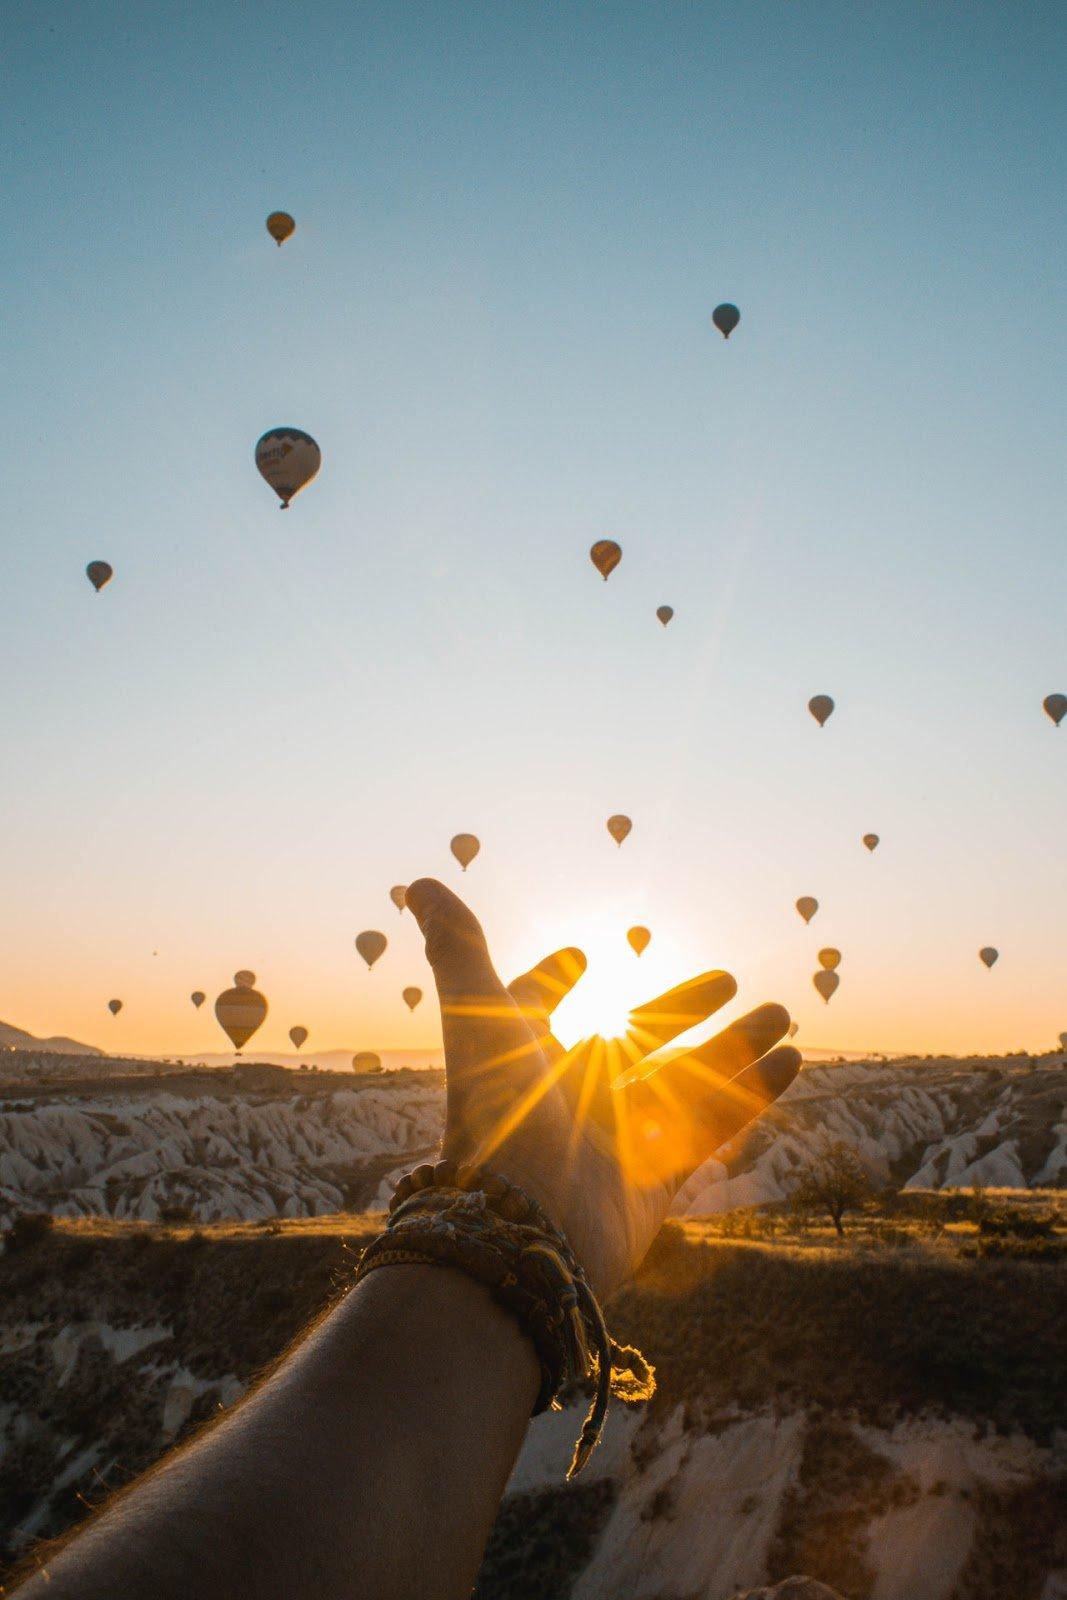 Balloons flying in sky